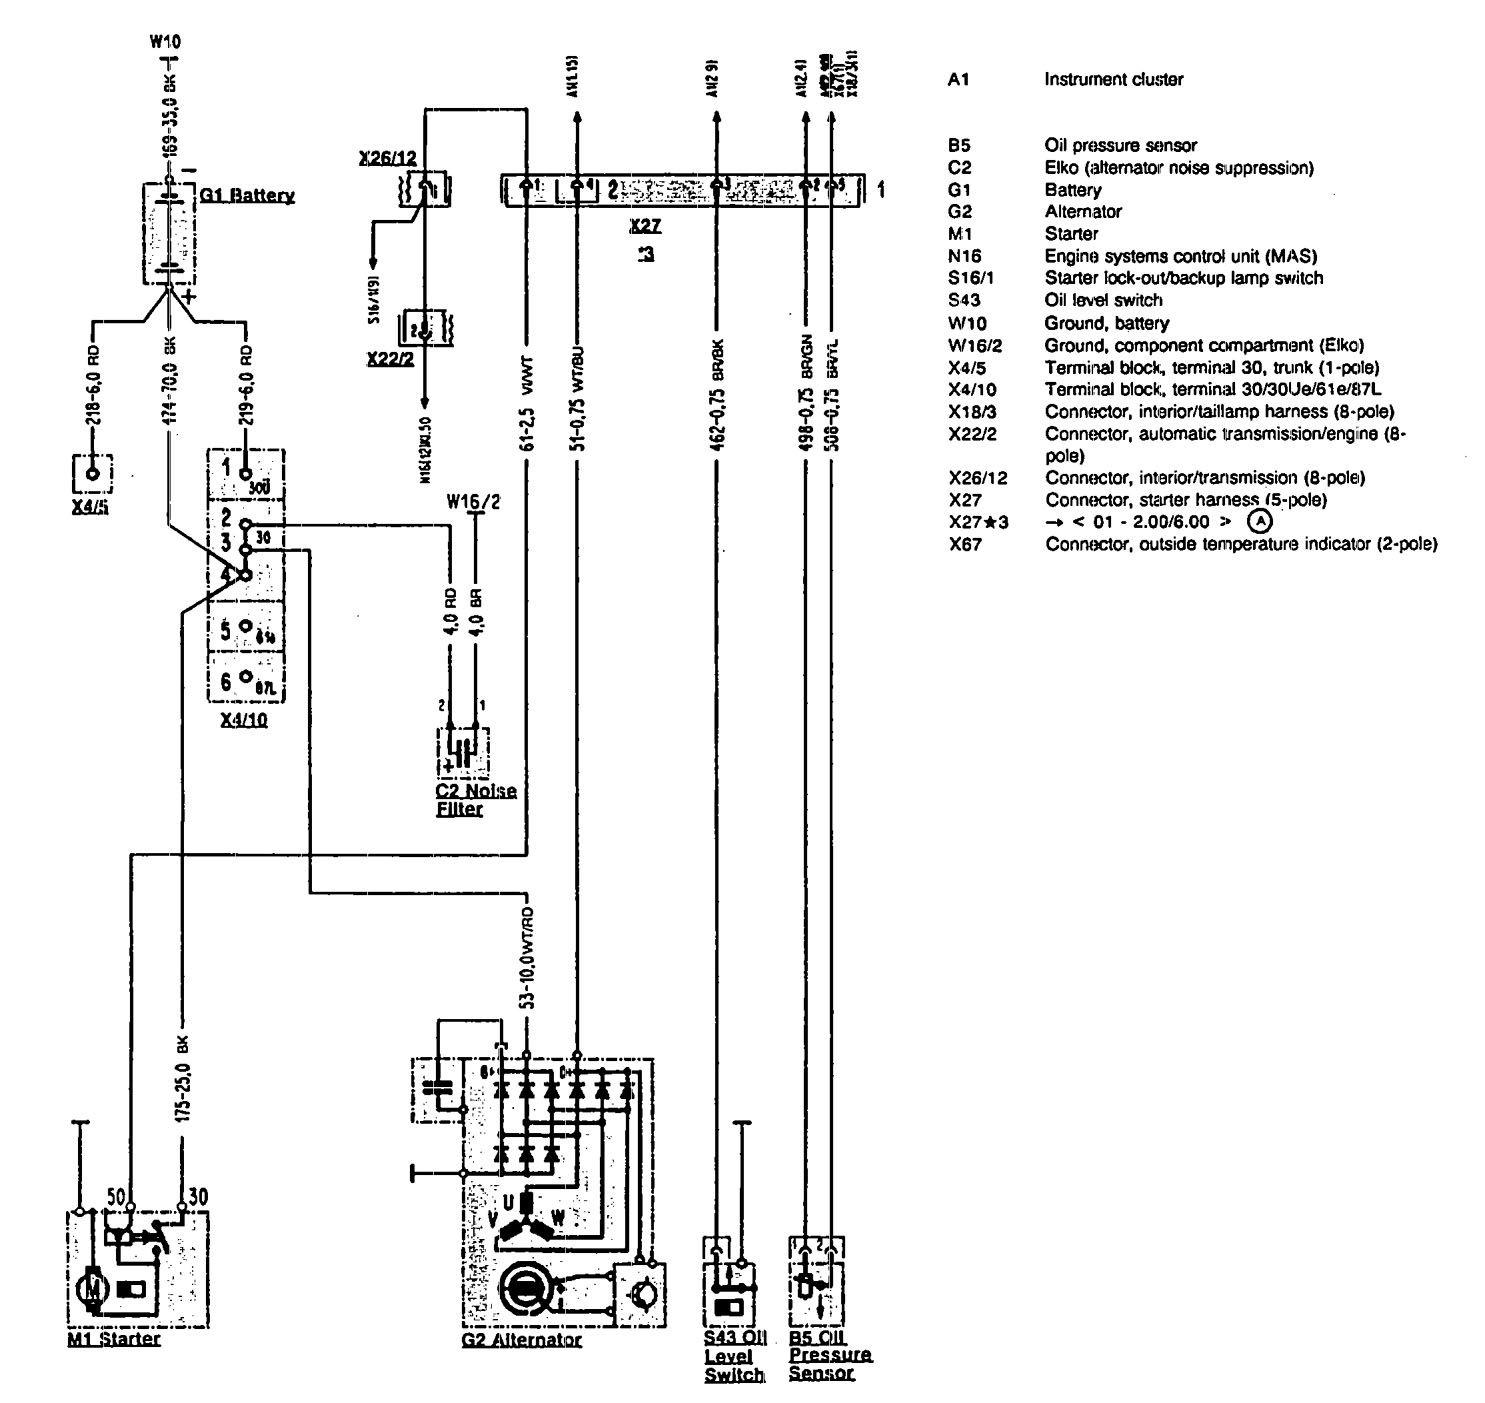 1990 mercury grand marquis wiring diagram mercedes benz 500sl  1990 1993  wiring diagrams starting  mercedes benz 500sl  1990 1993